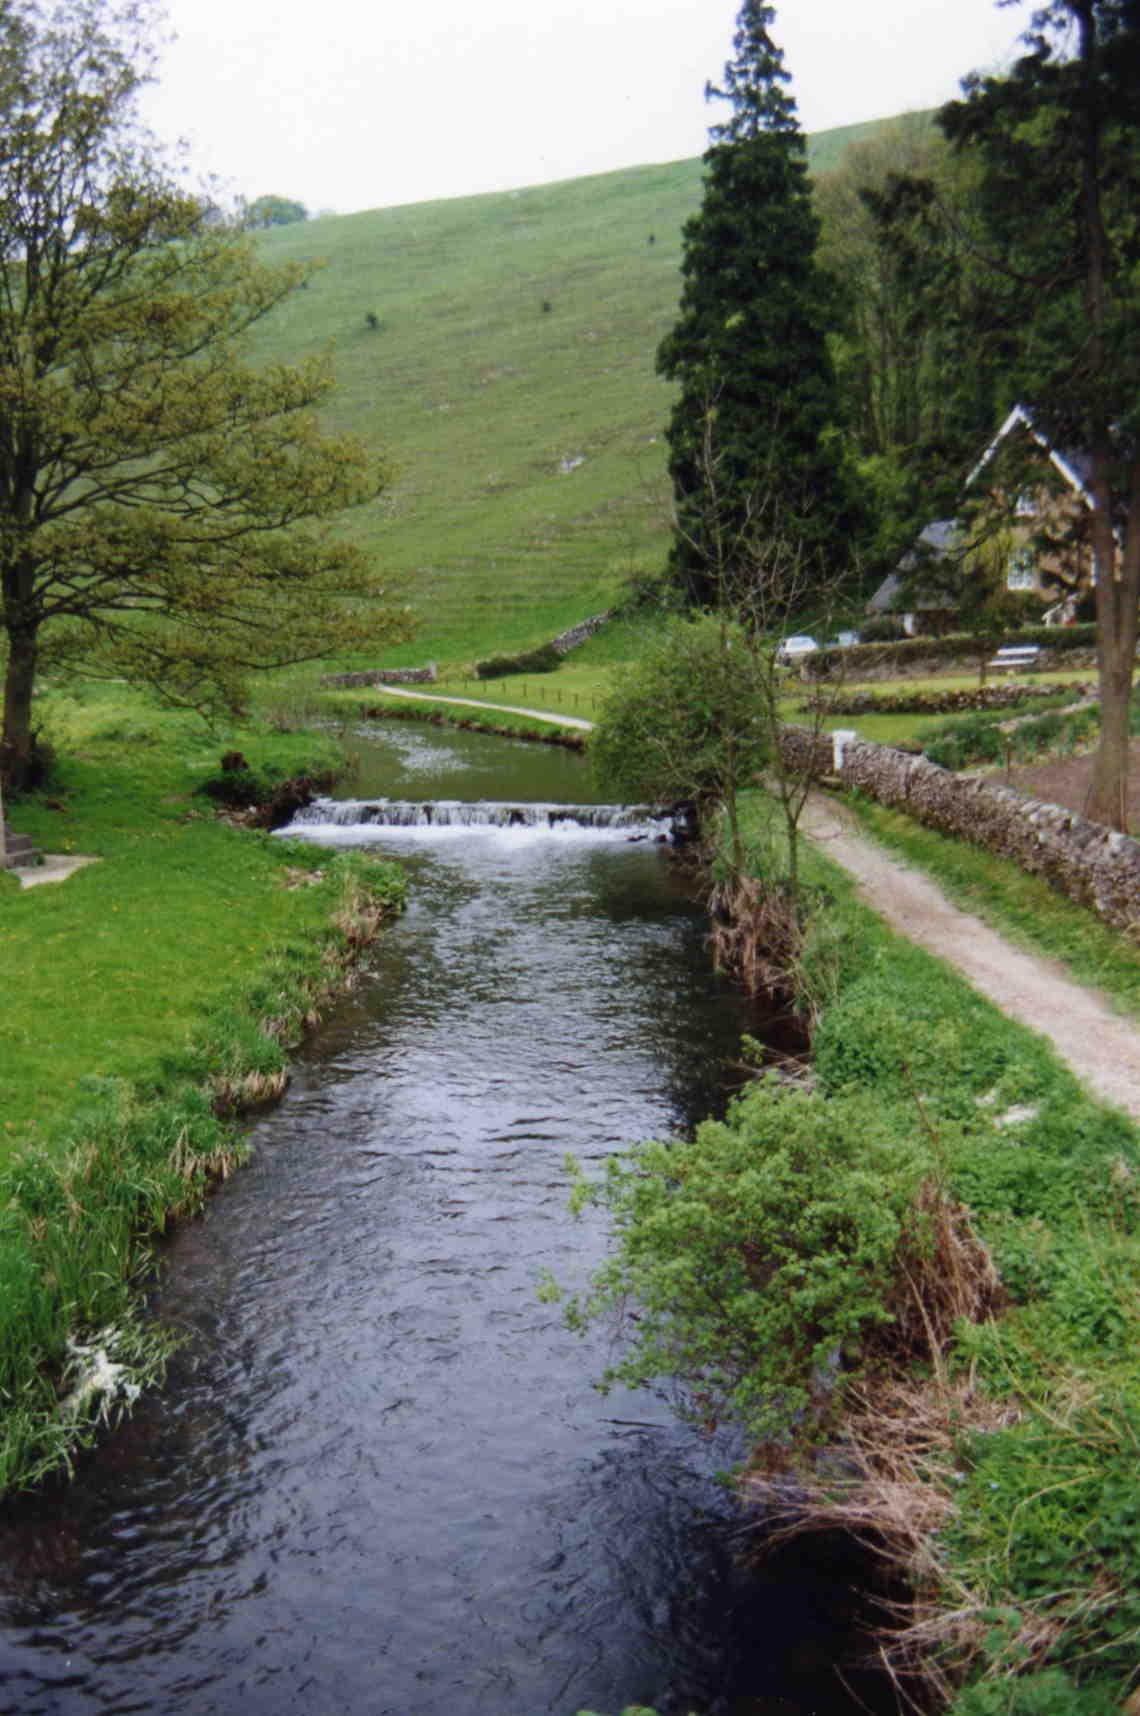 Upstream to Dove Cottage